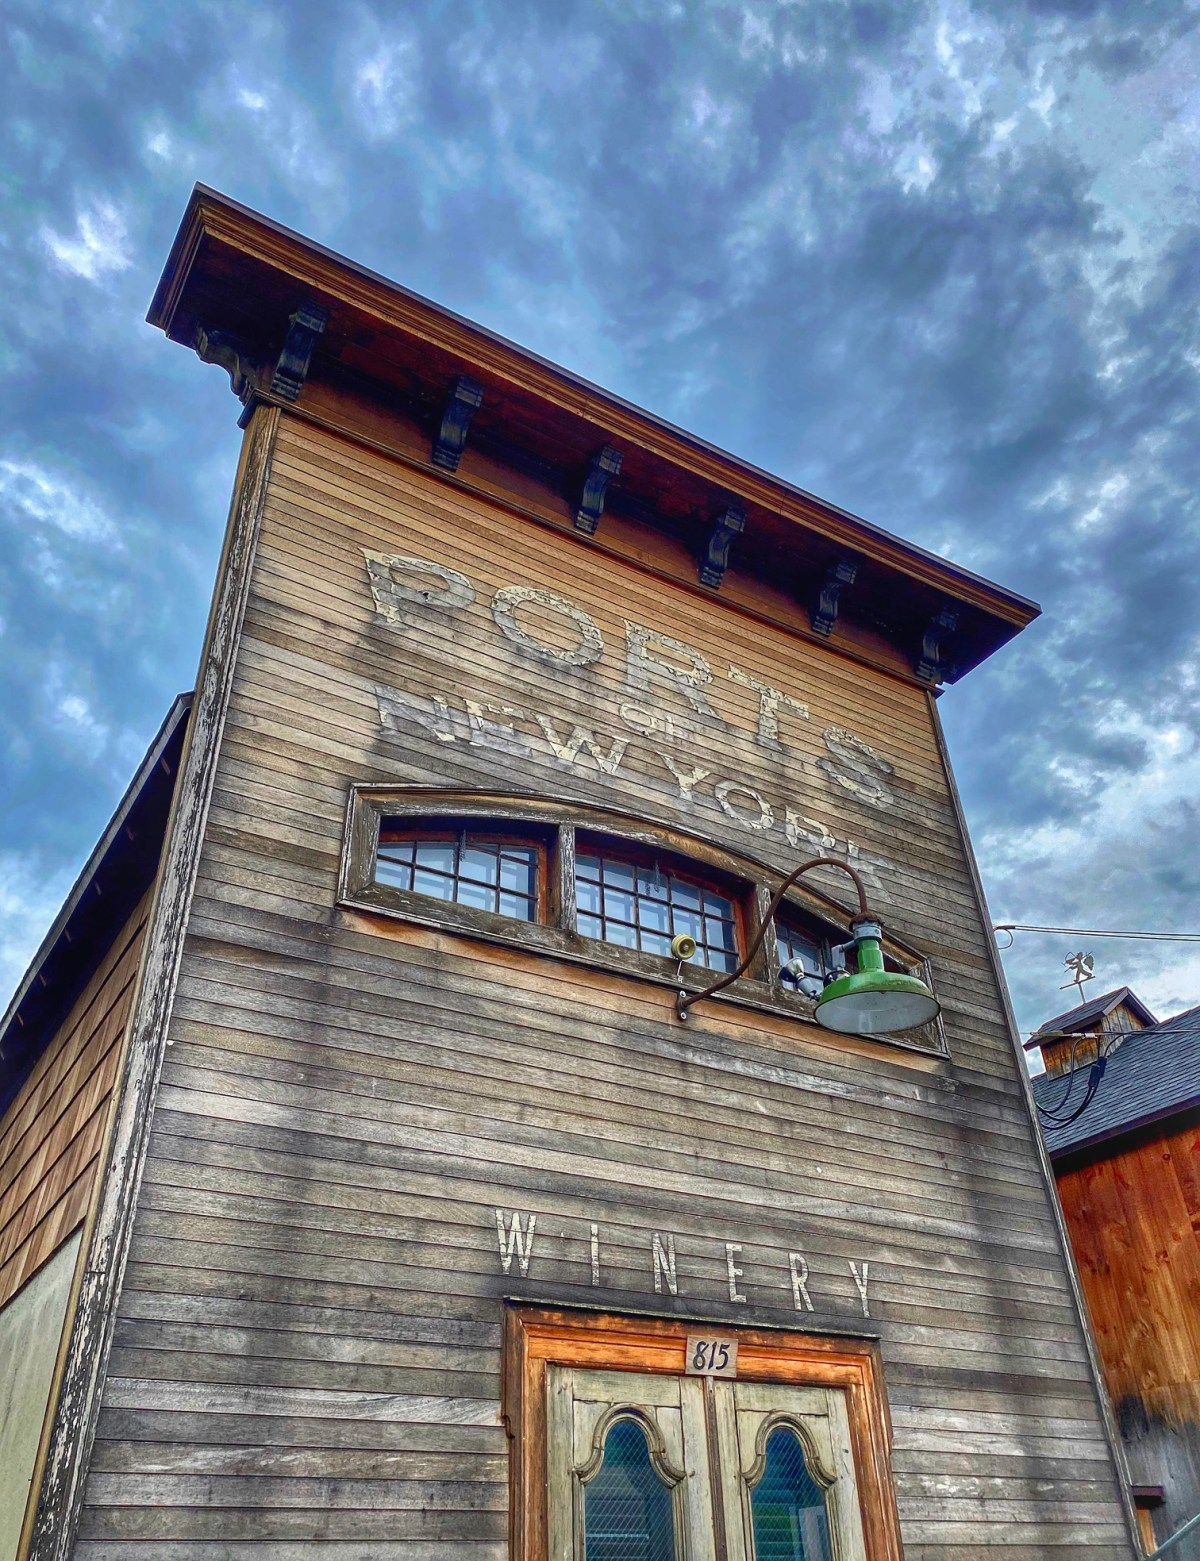 Ports of New York Winery #fingerlakeswineries #portsofnewyork #whattodointhefingerlakes #hottospendaweekendinthefingerlakes #fingerlakesny #ithacany #ithacawineries #wineriesnearithaca